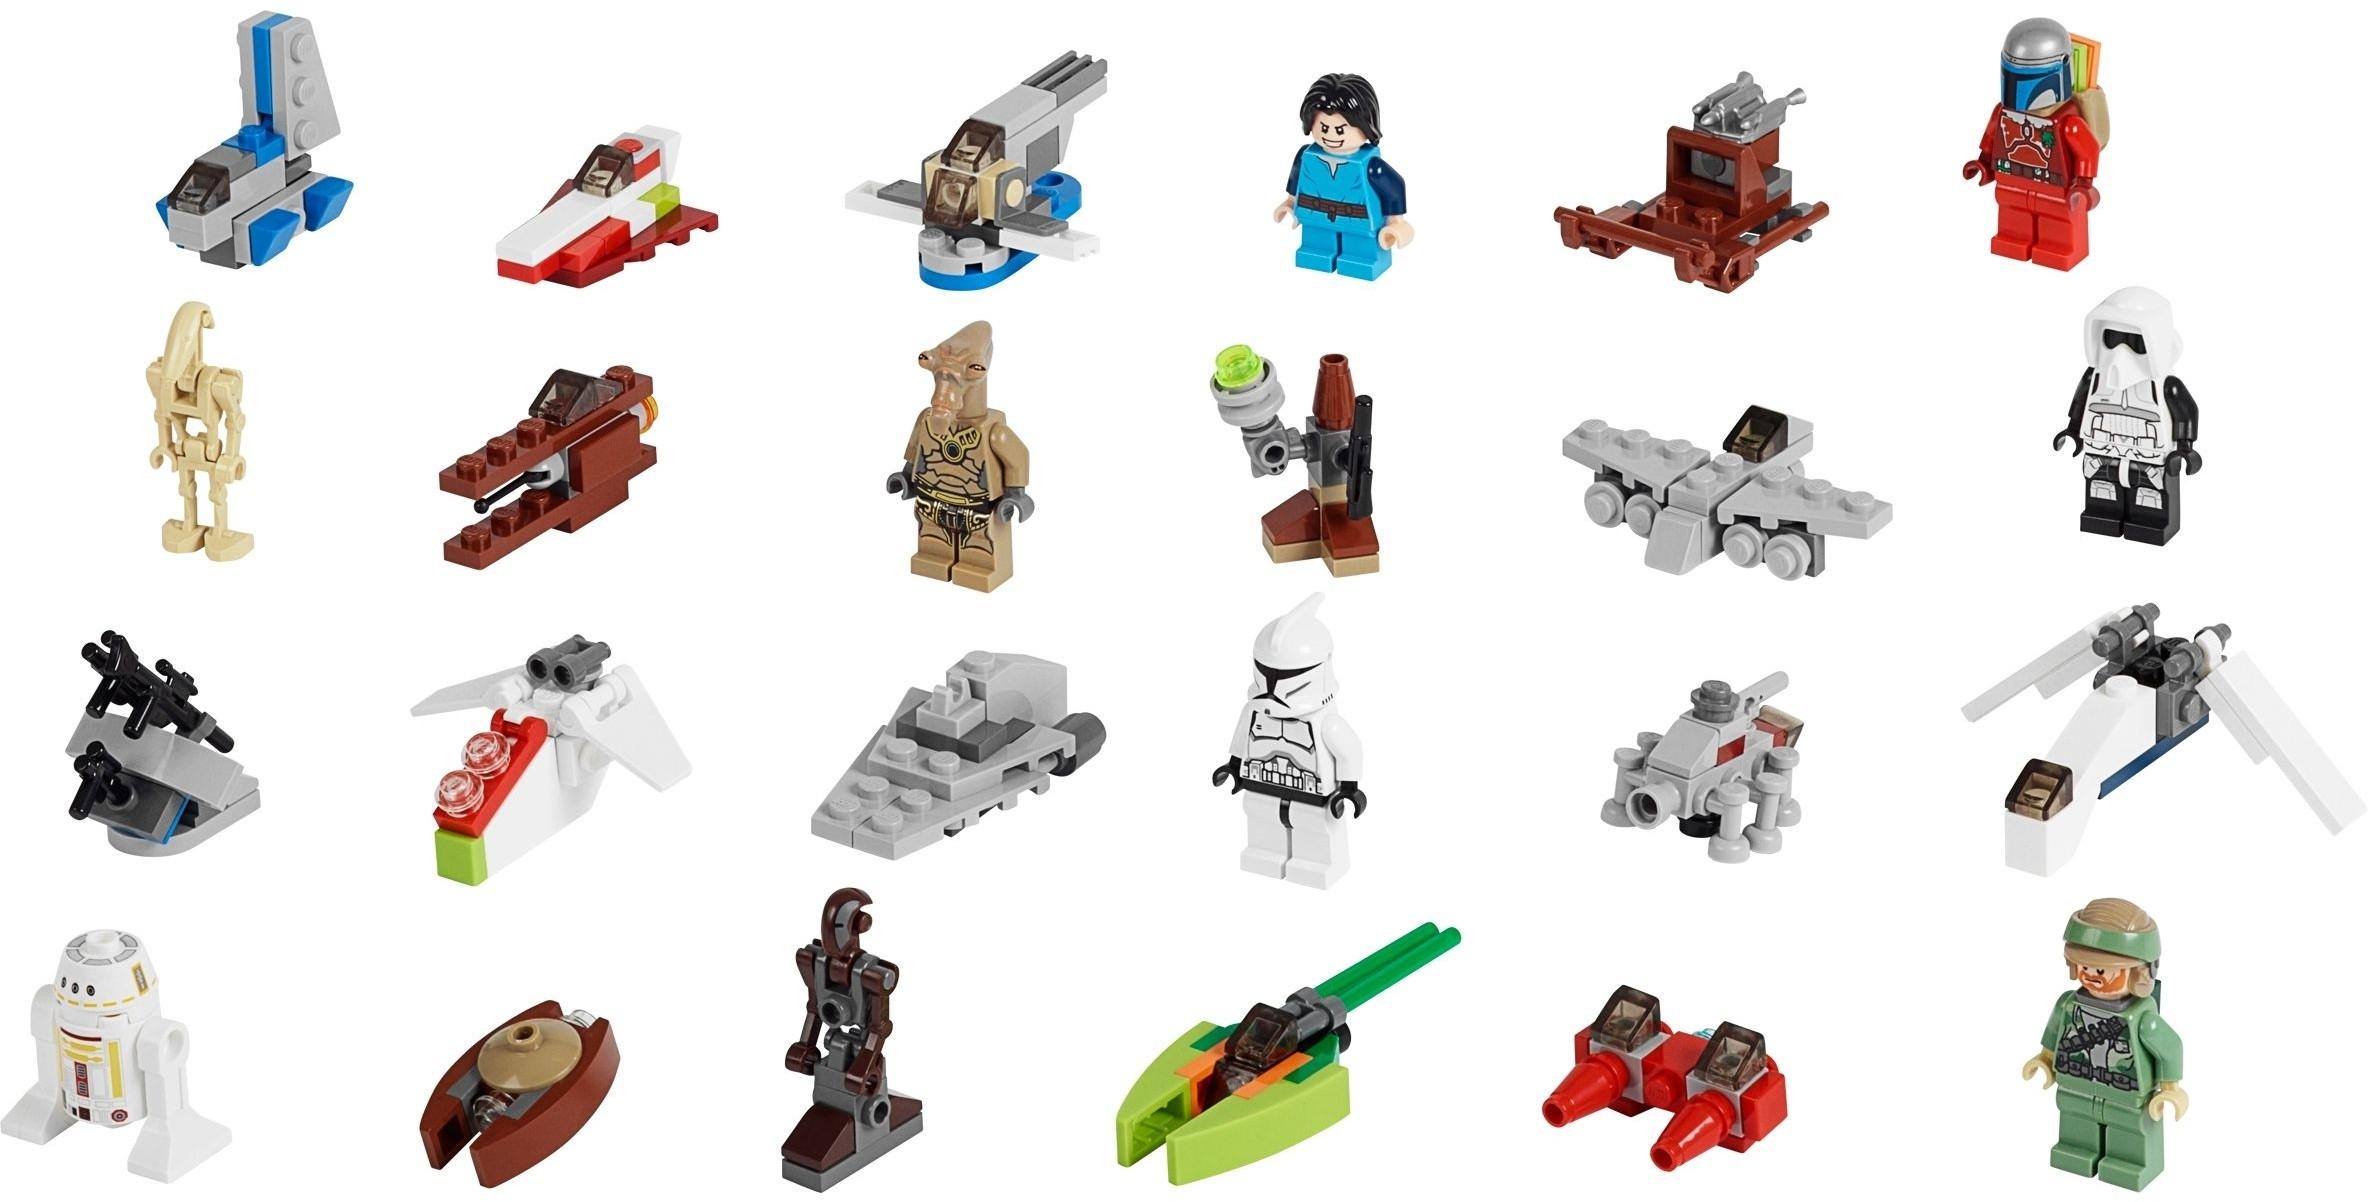 Lego Star Wars Advent Calendar Instructions 75023, Star Wars for Lego Star Wars Instructions Advent Calendar